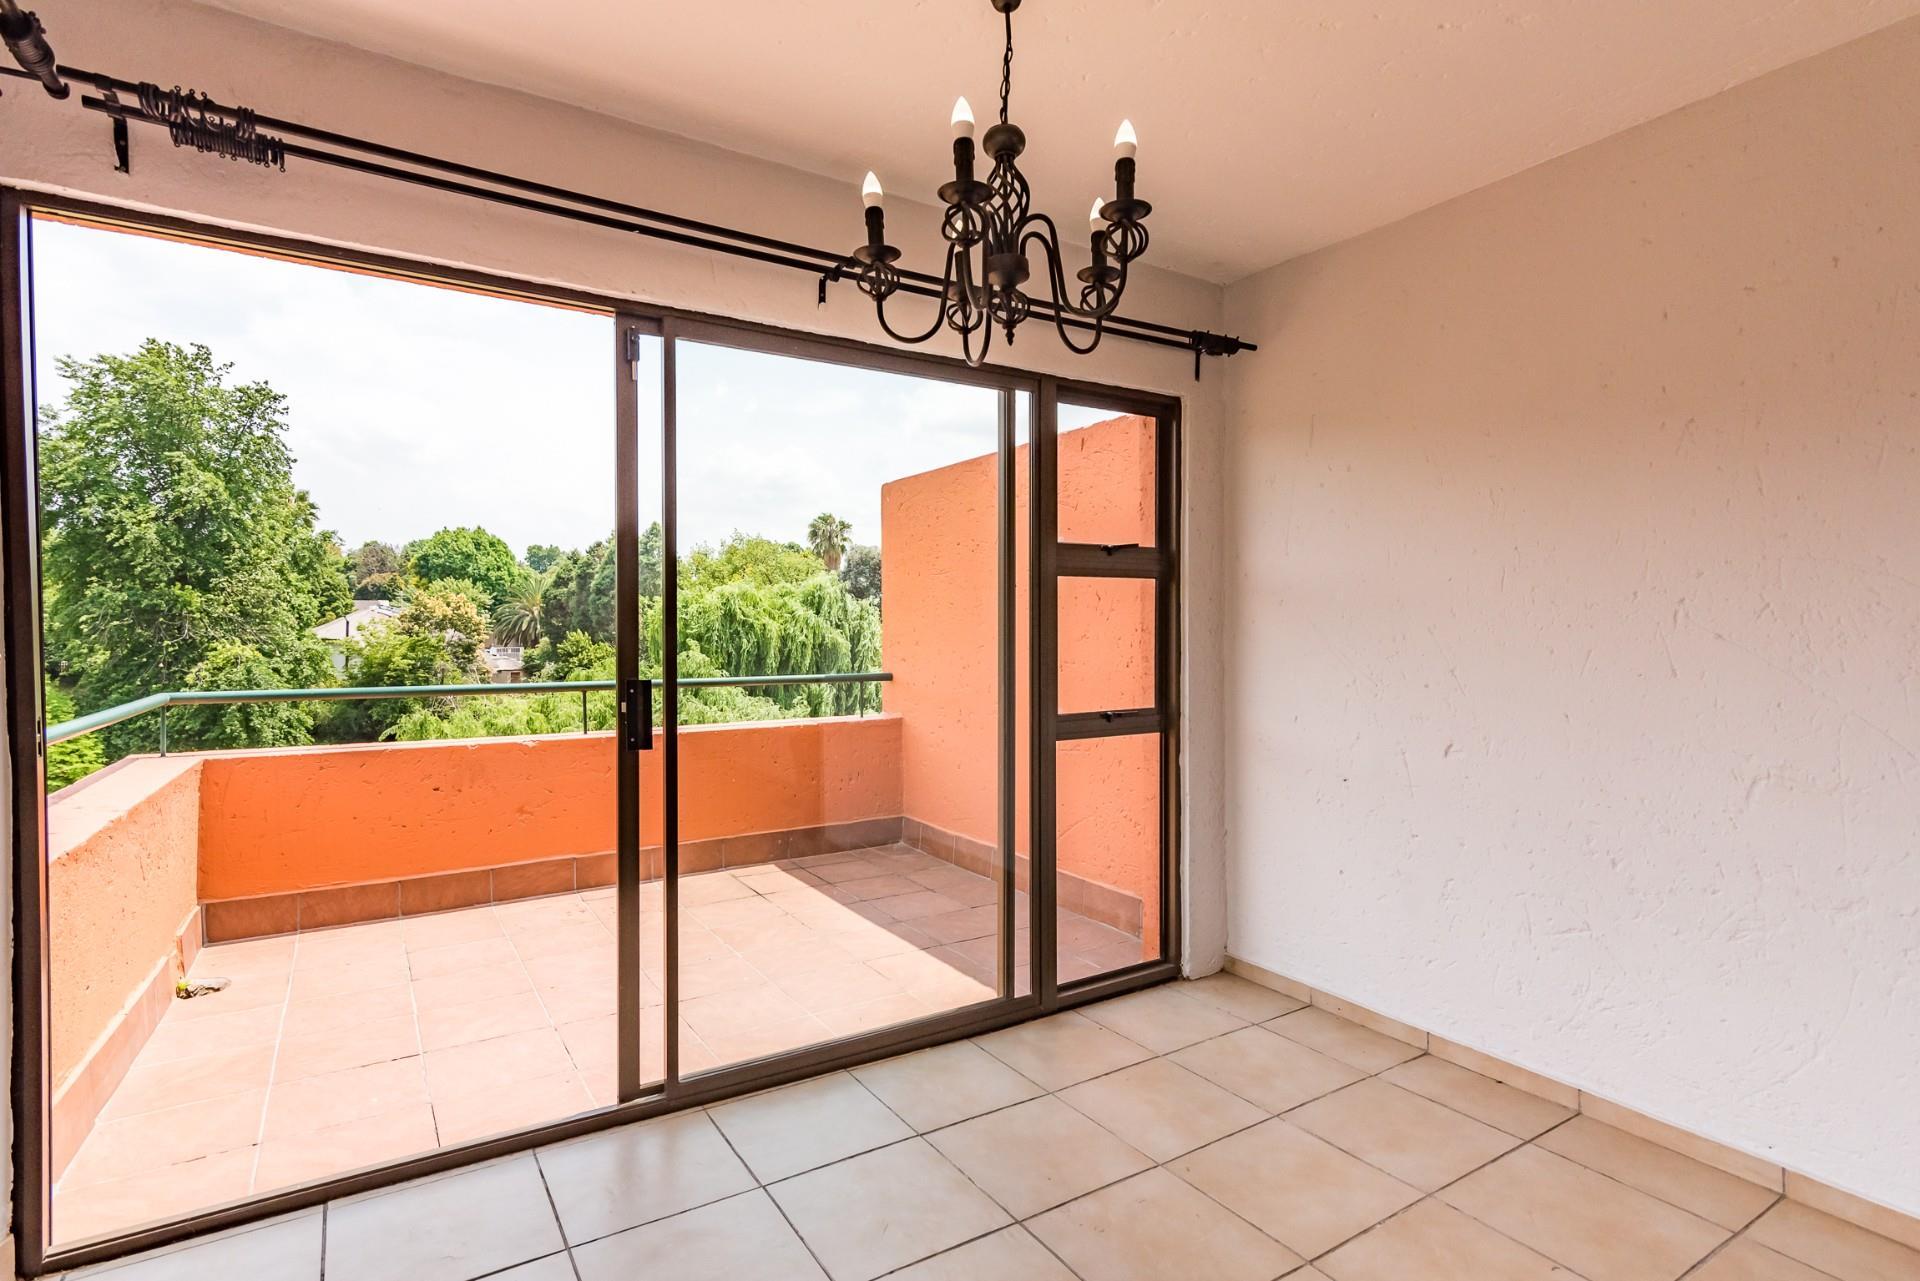 1 Bedroom Apartment / Flat For Sale in Randpark Ridge